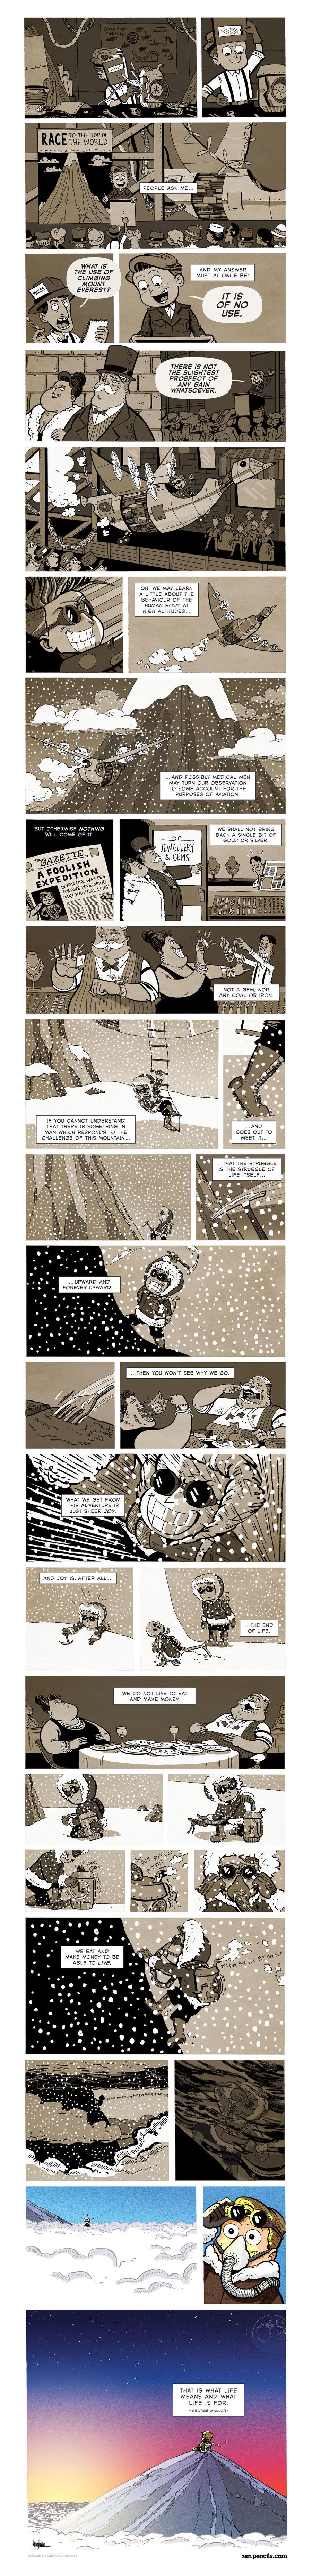 Zen Pencils Comic Strip for July 27, 2015